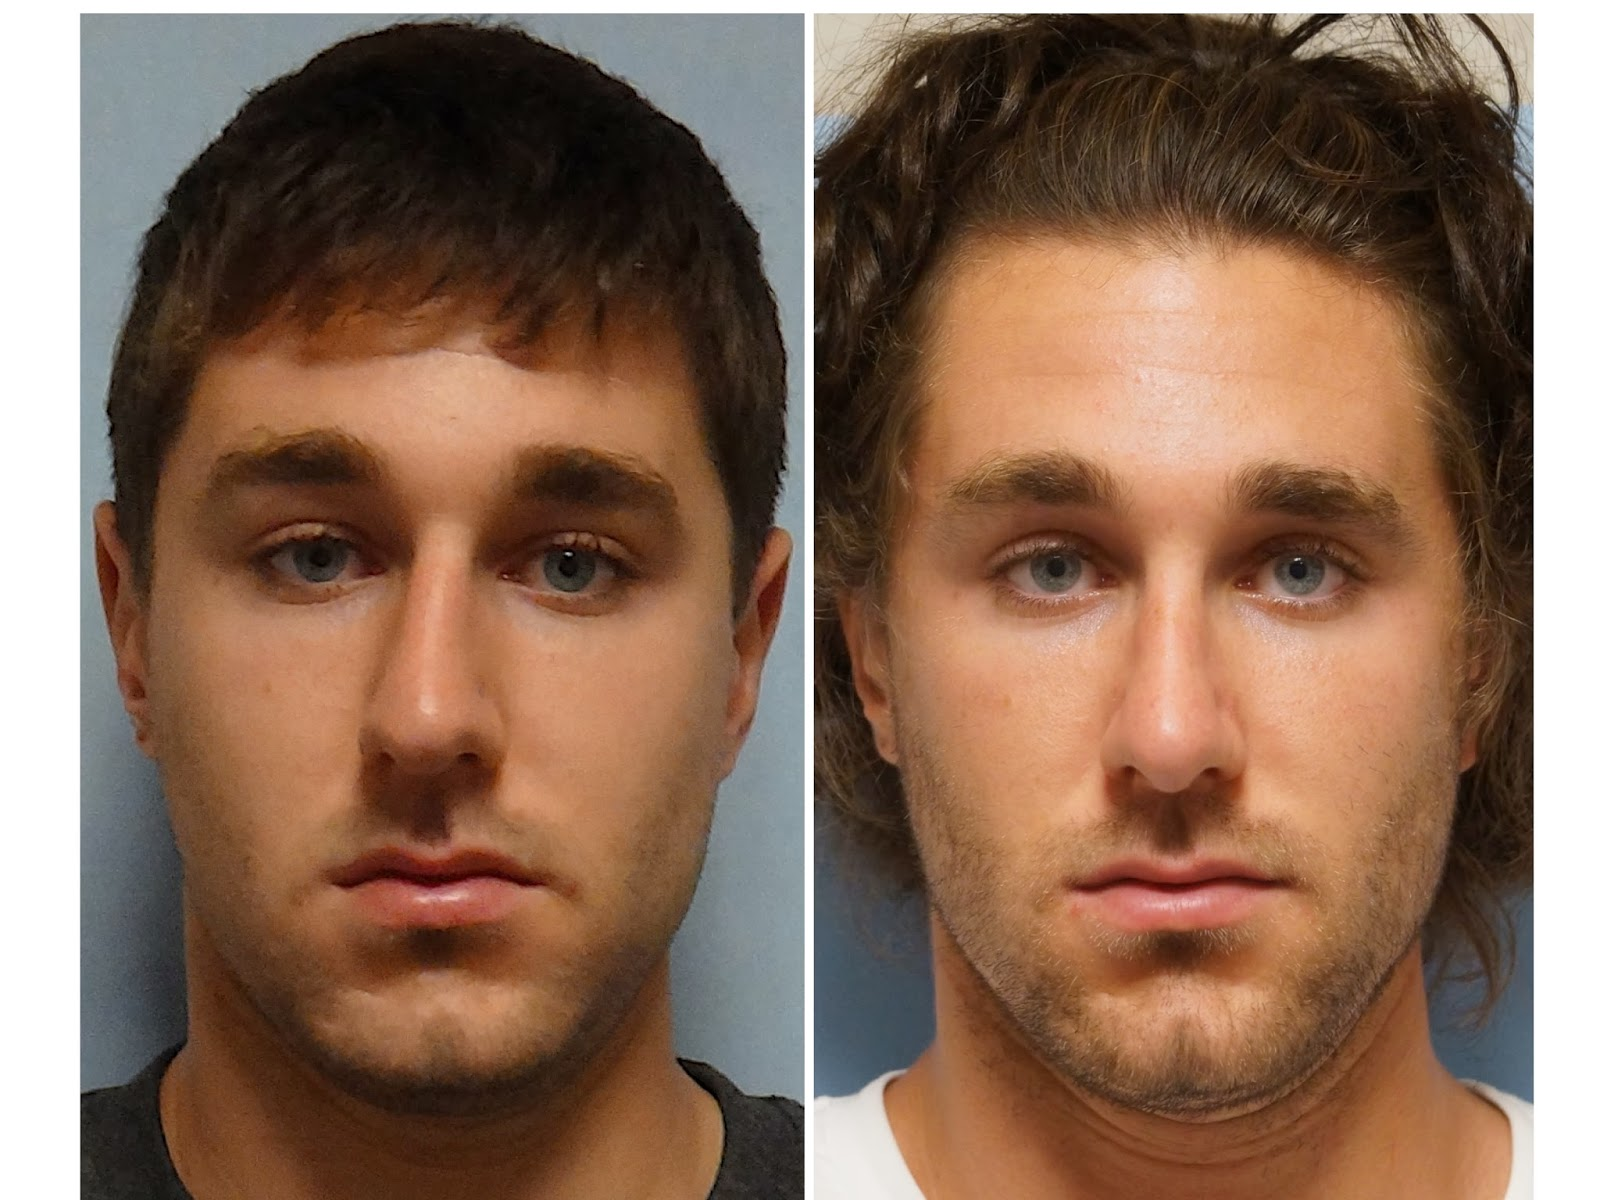 Facial Plastic Surgery: Male Rhinoplasty, Cosmetic